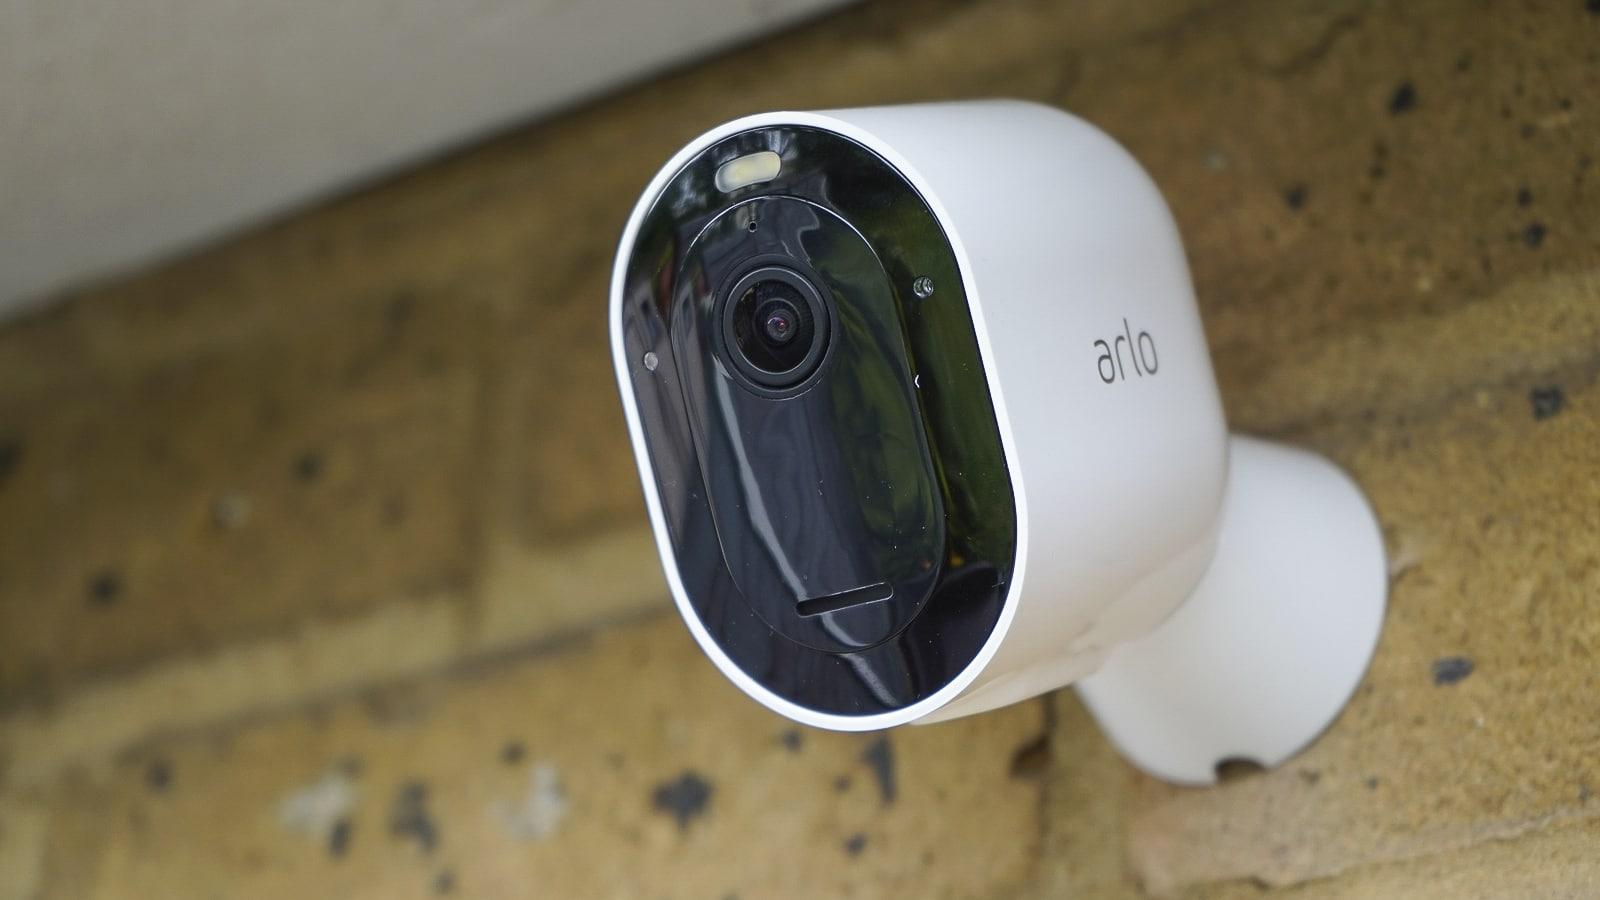 6 Wireless Security Cameras 2021